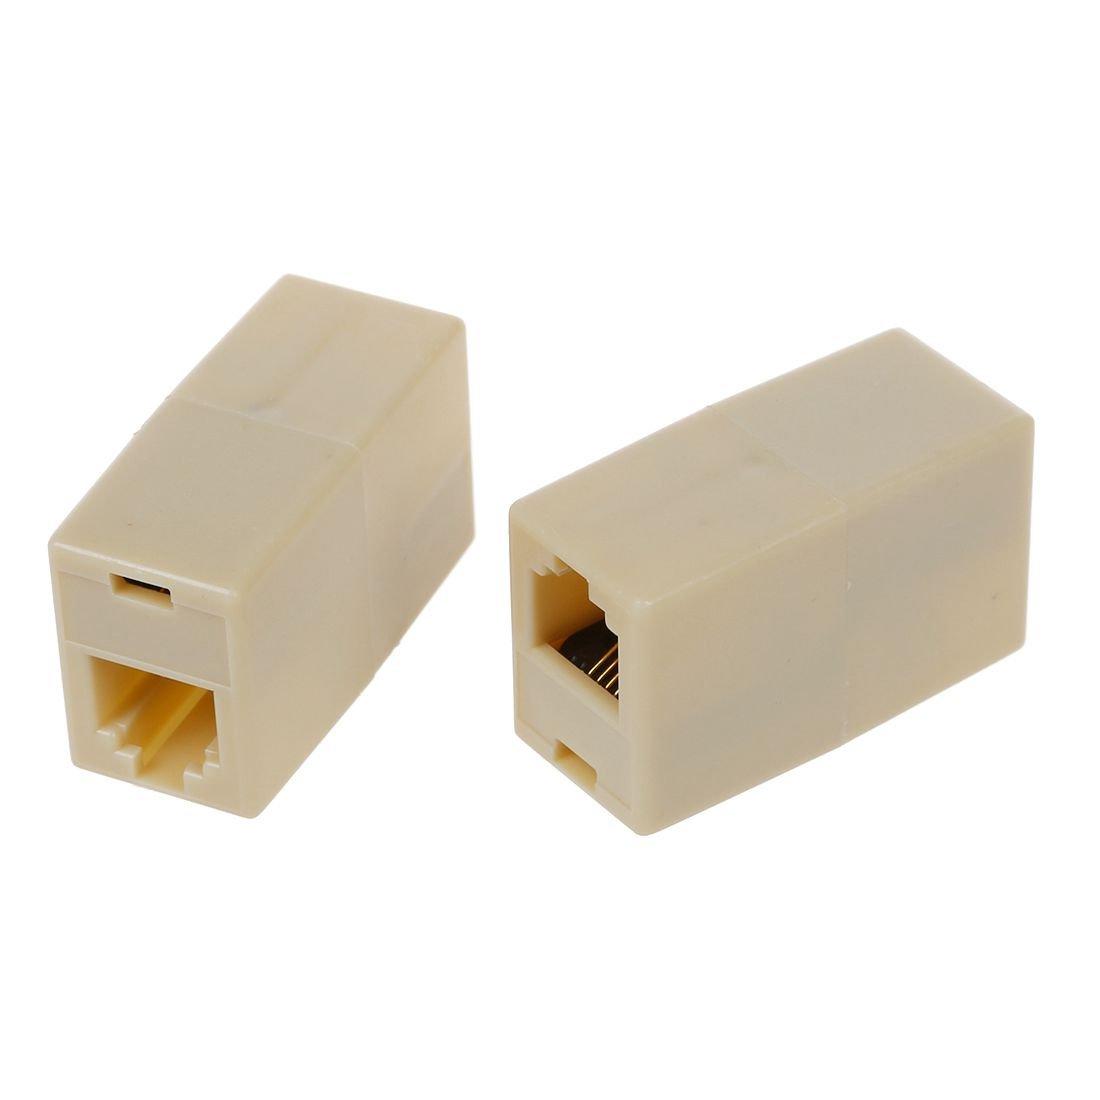 hembra Conector inline de cable de telefono TOOGOO 5pzs Beige Plastico RJ11 6P4C hembra R